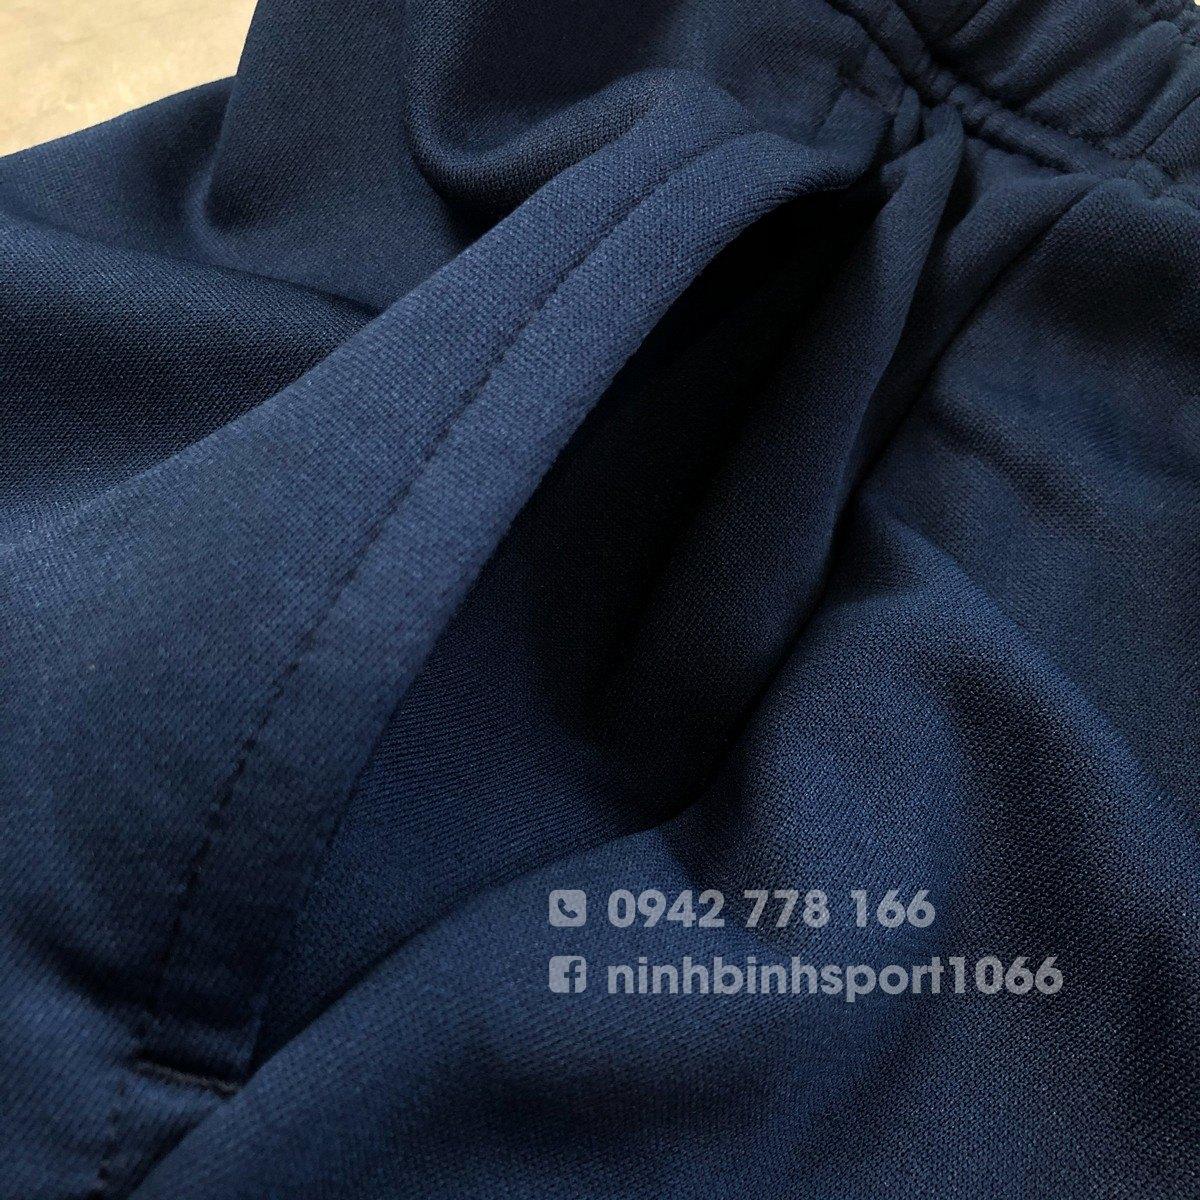 Bộ thể thao nam Adidas Re-Focus Tracksuit CF1618